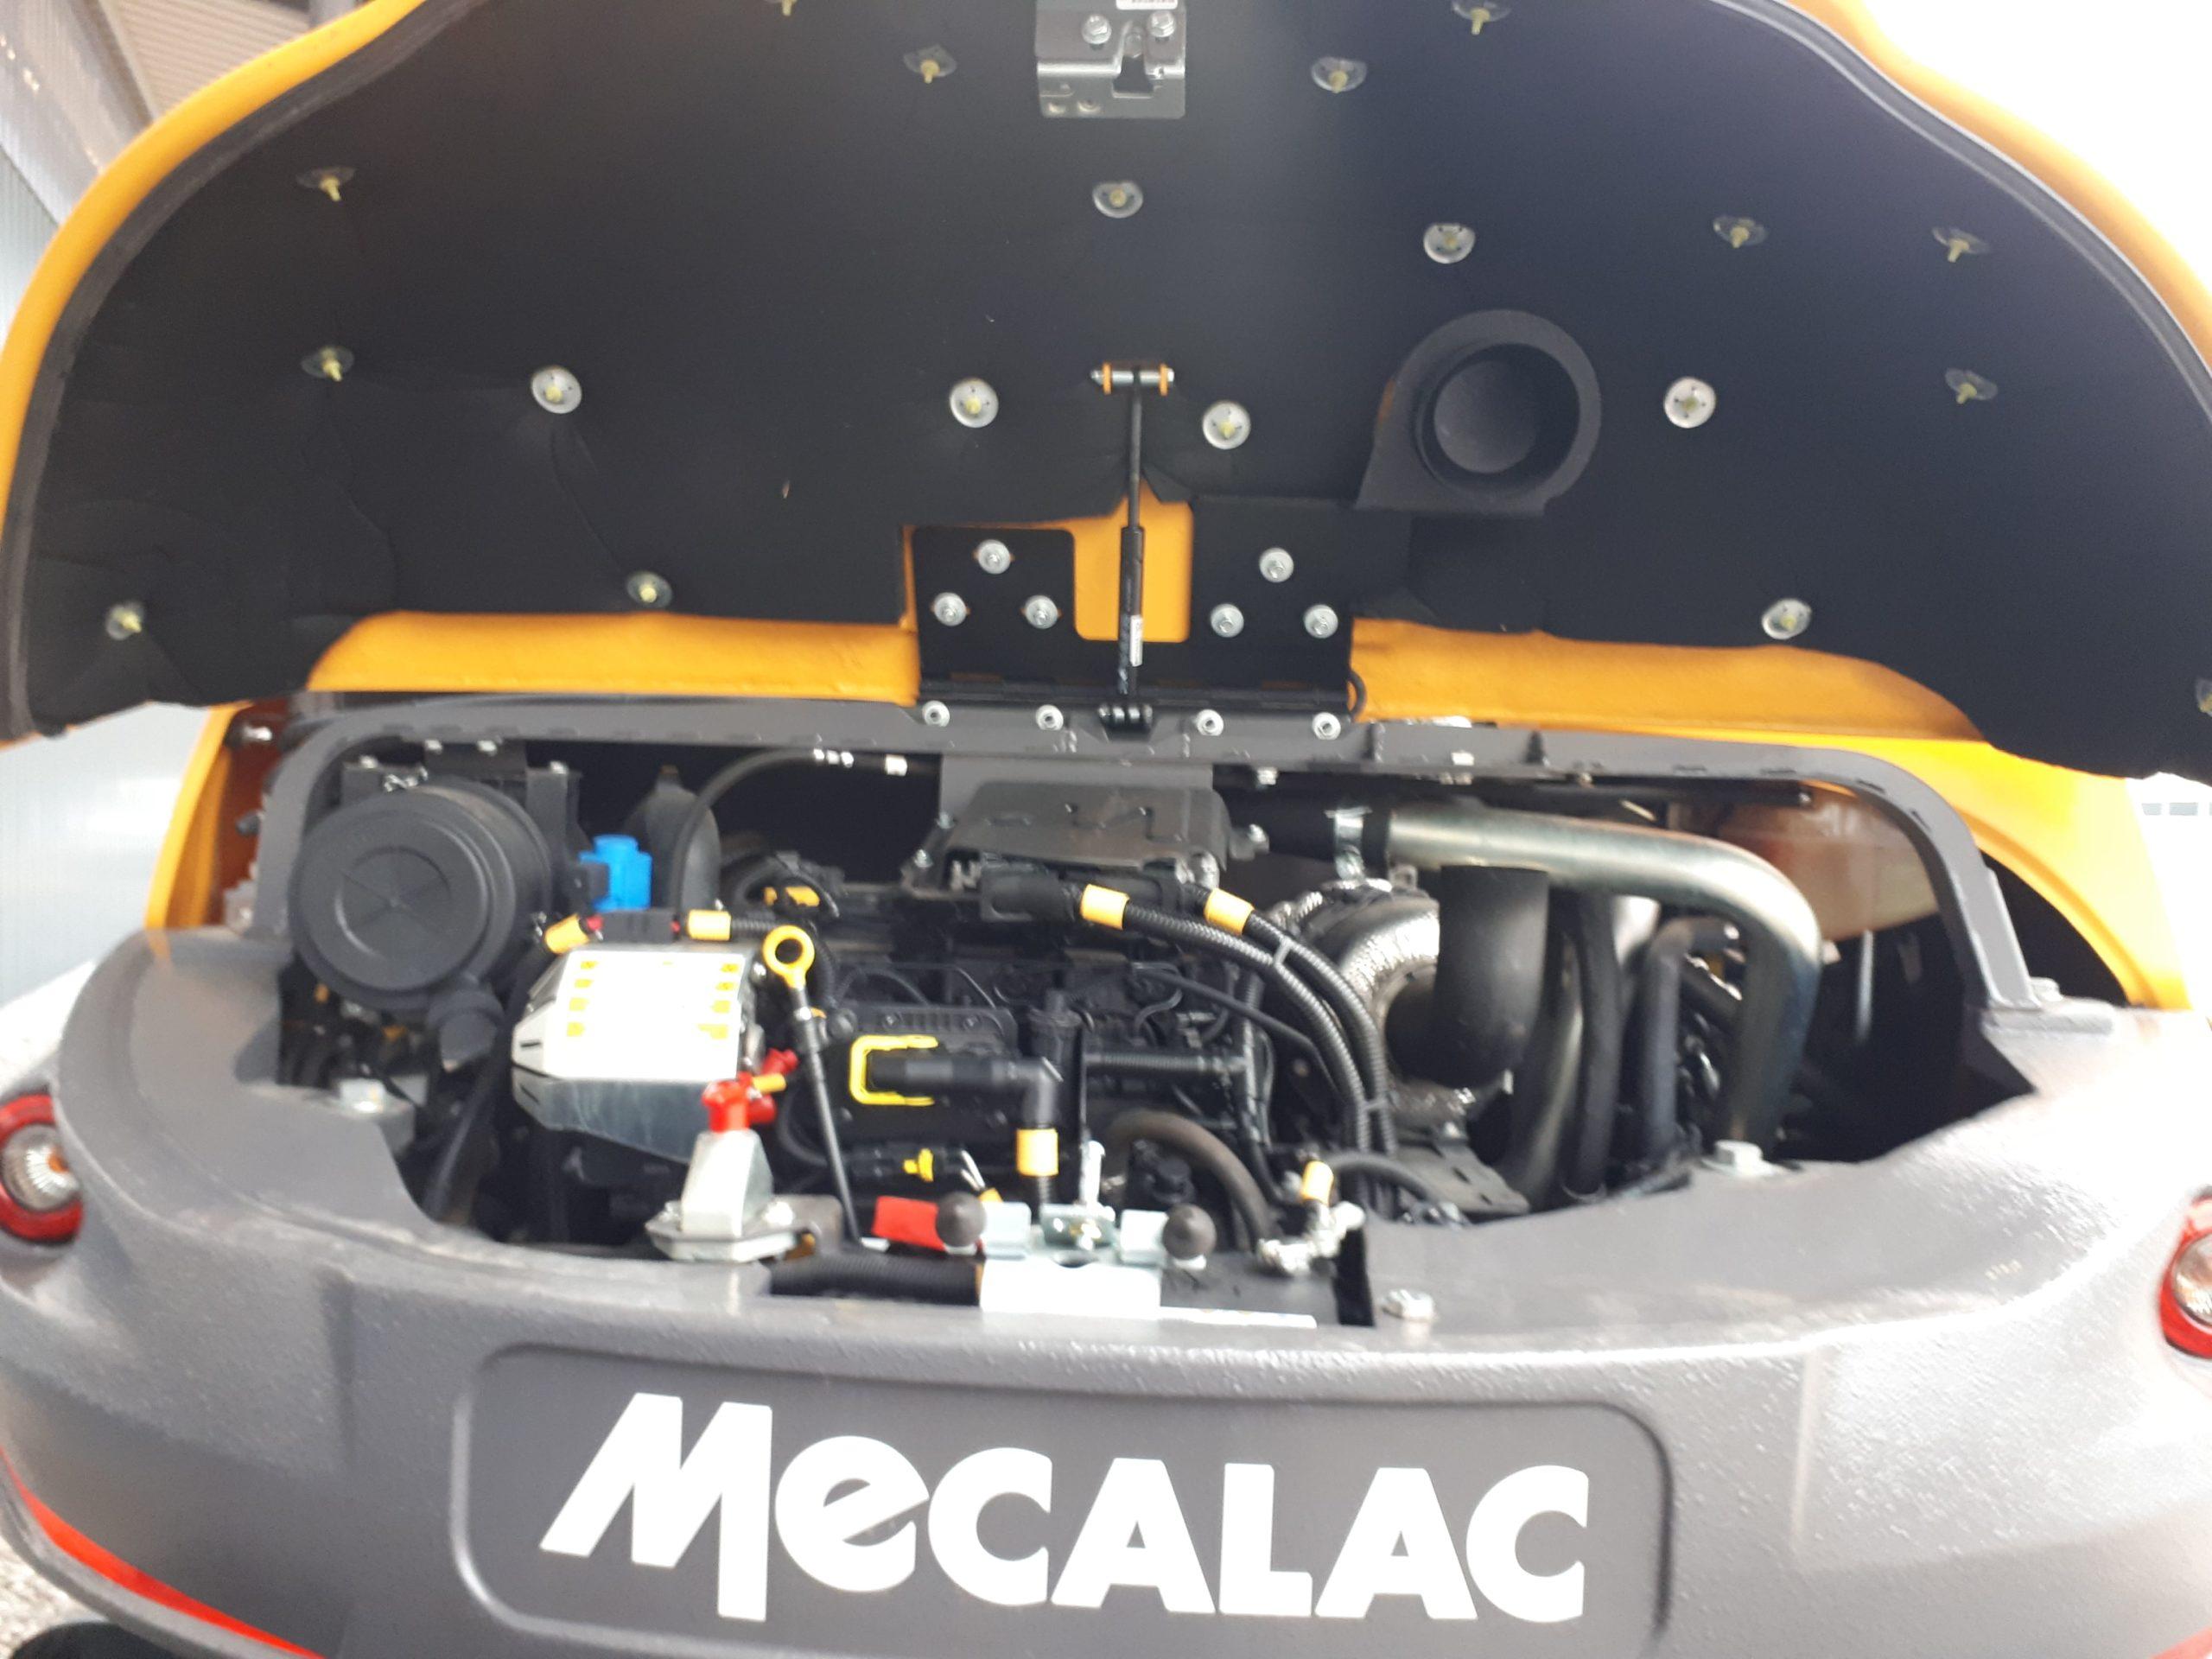 9MWR_Mobilbagger_Mecalac_MBN_kaufen_Stadthagen_Hoppe_Hannover_Motor